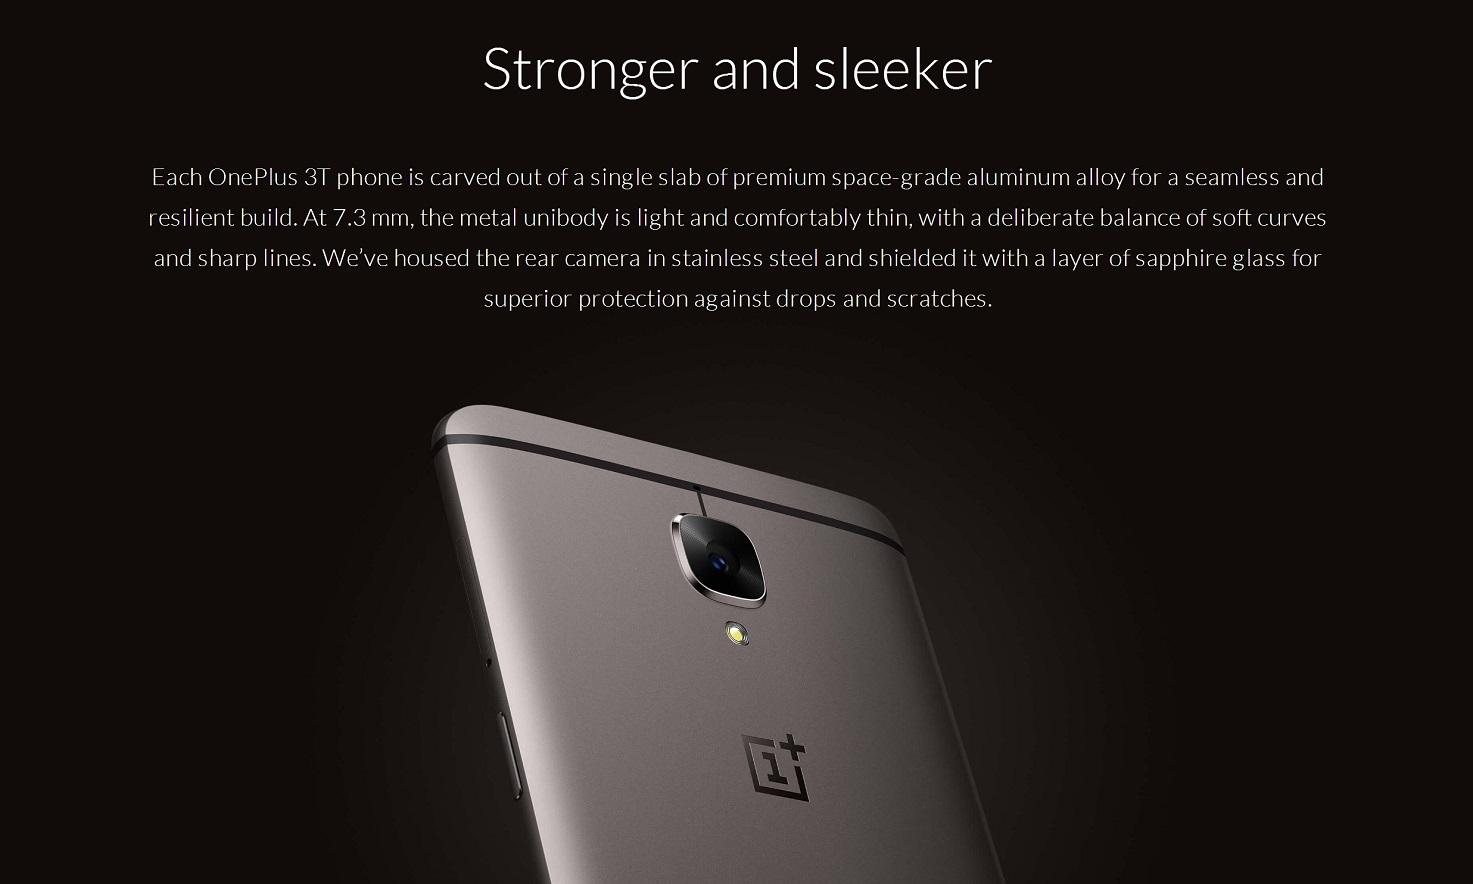 OnePlus 3T au meilleur prix